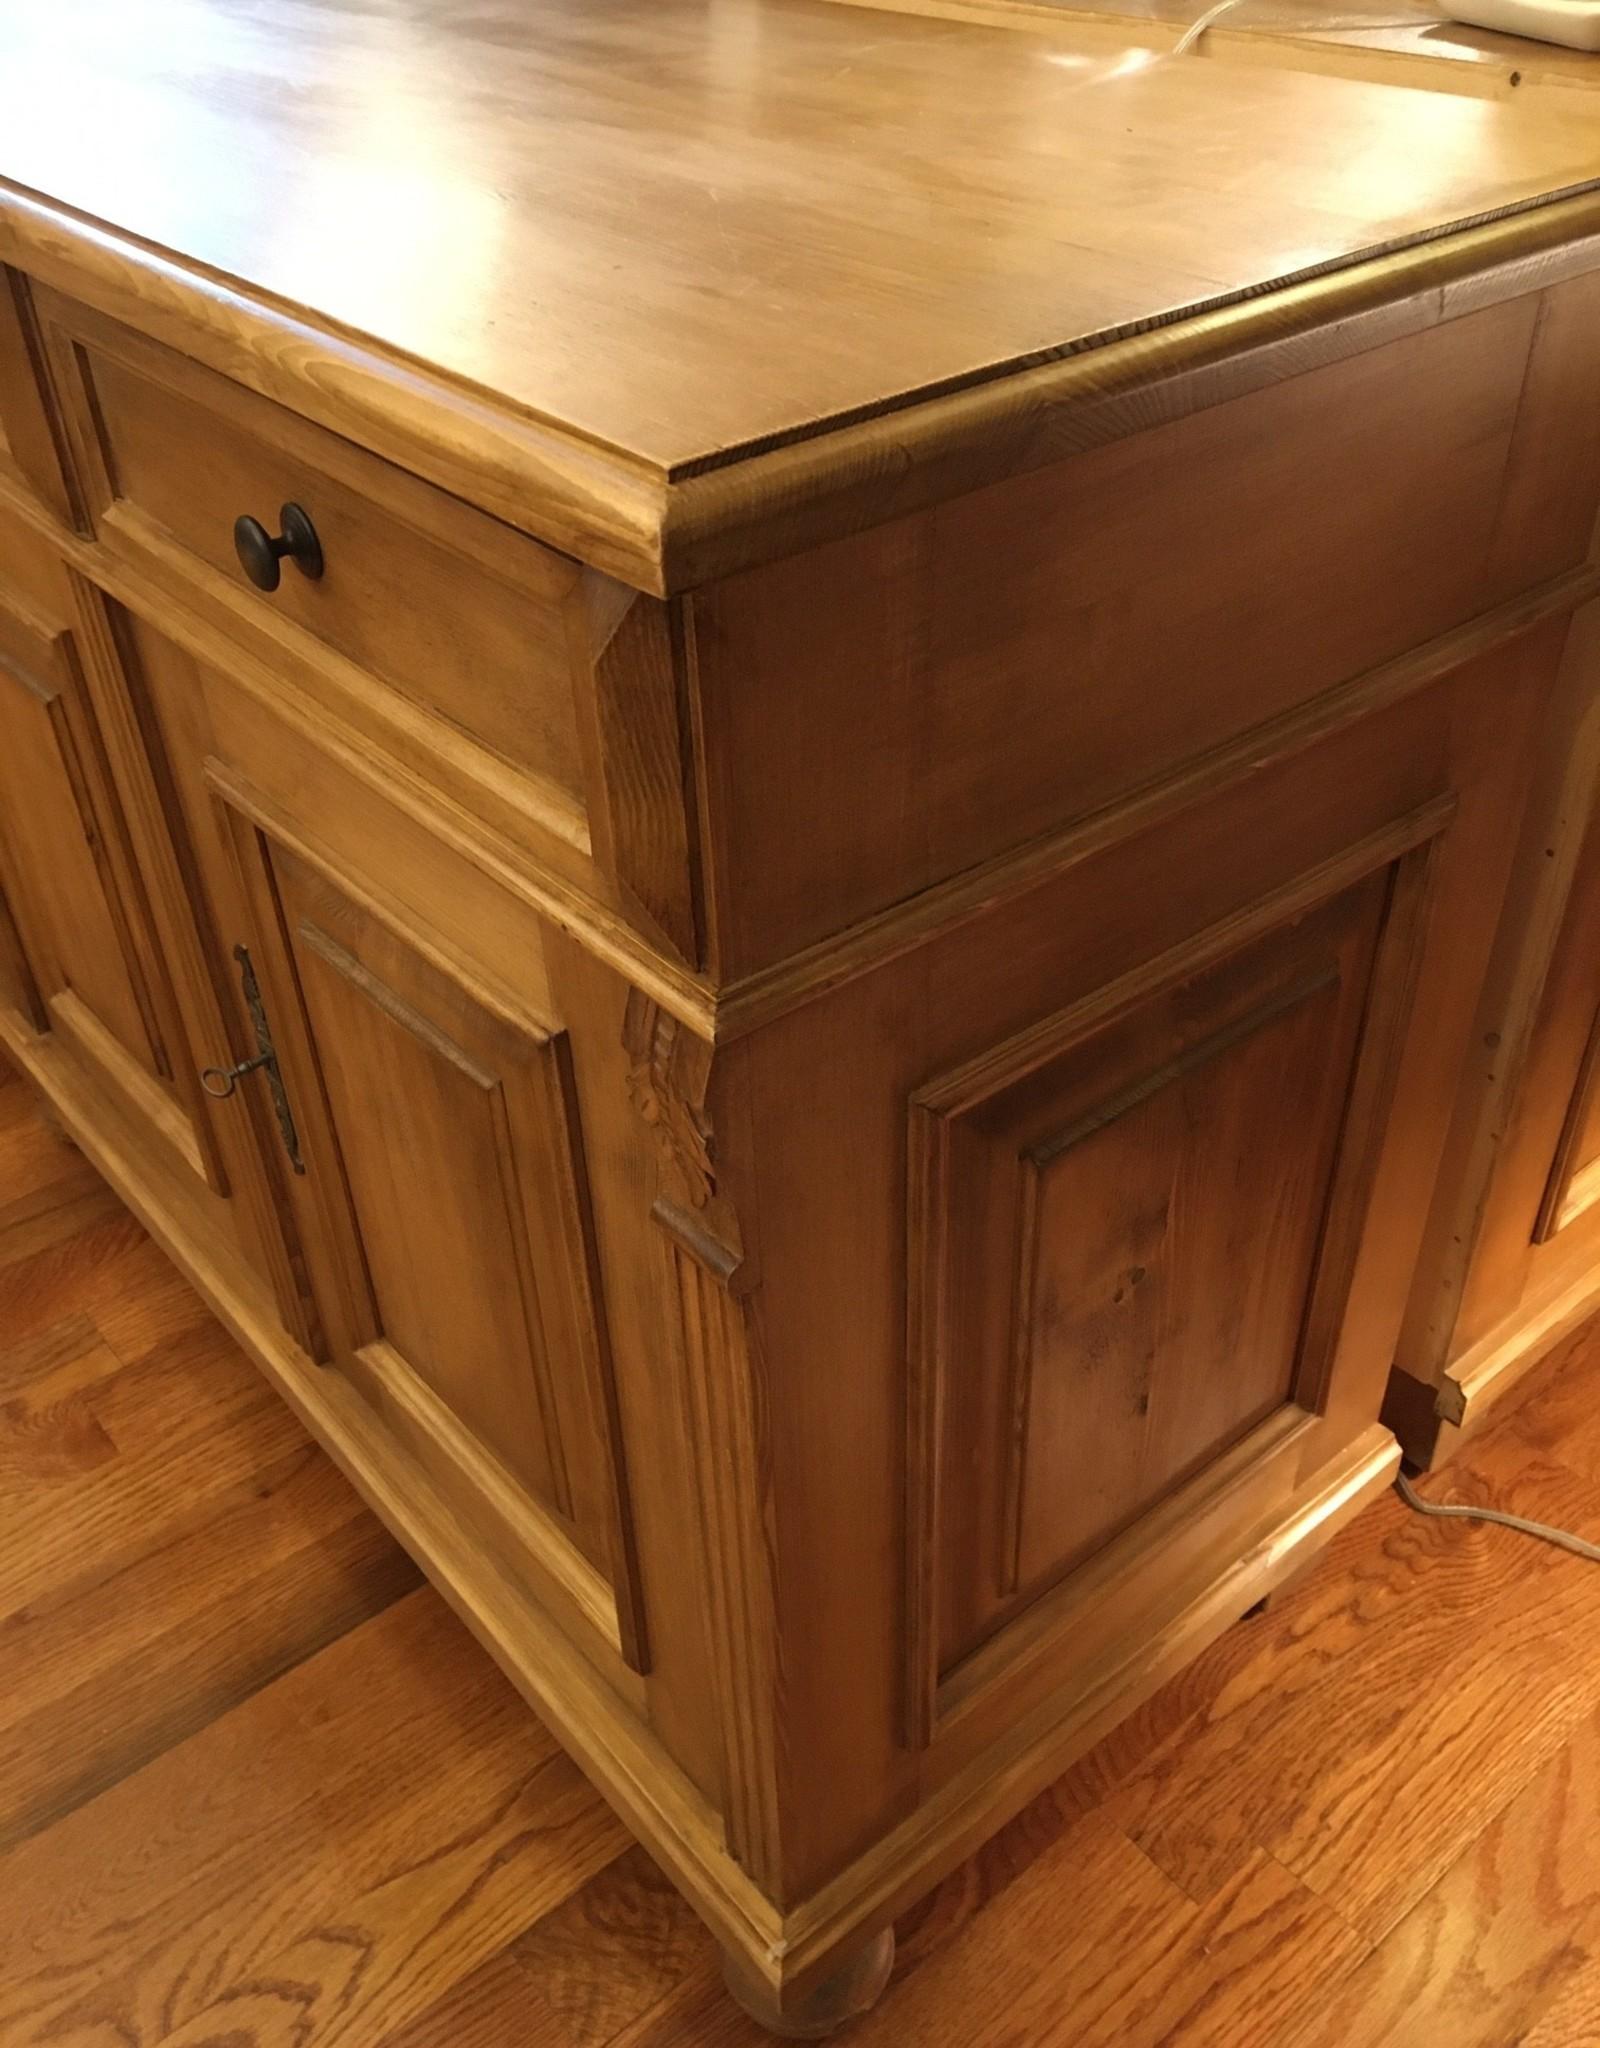 "4 Door Buffet, 4 drawers, 84"" x 21.5"" x 35.5"" Distress Wax Finish"